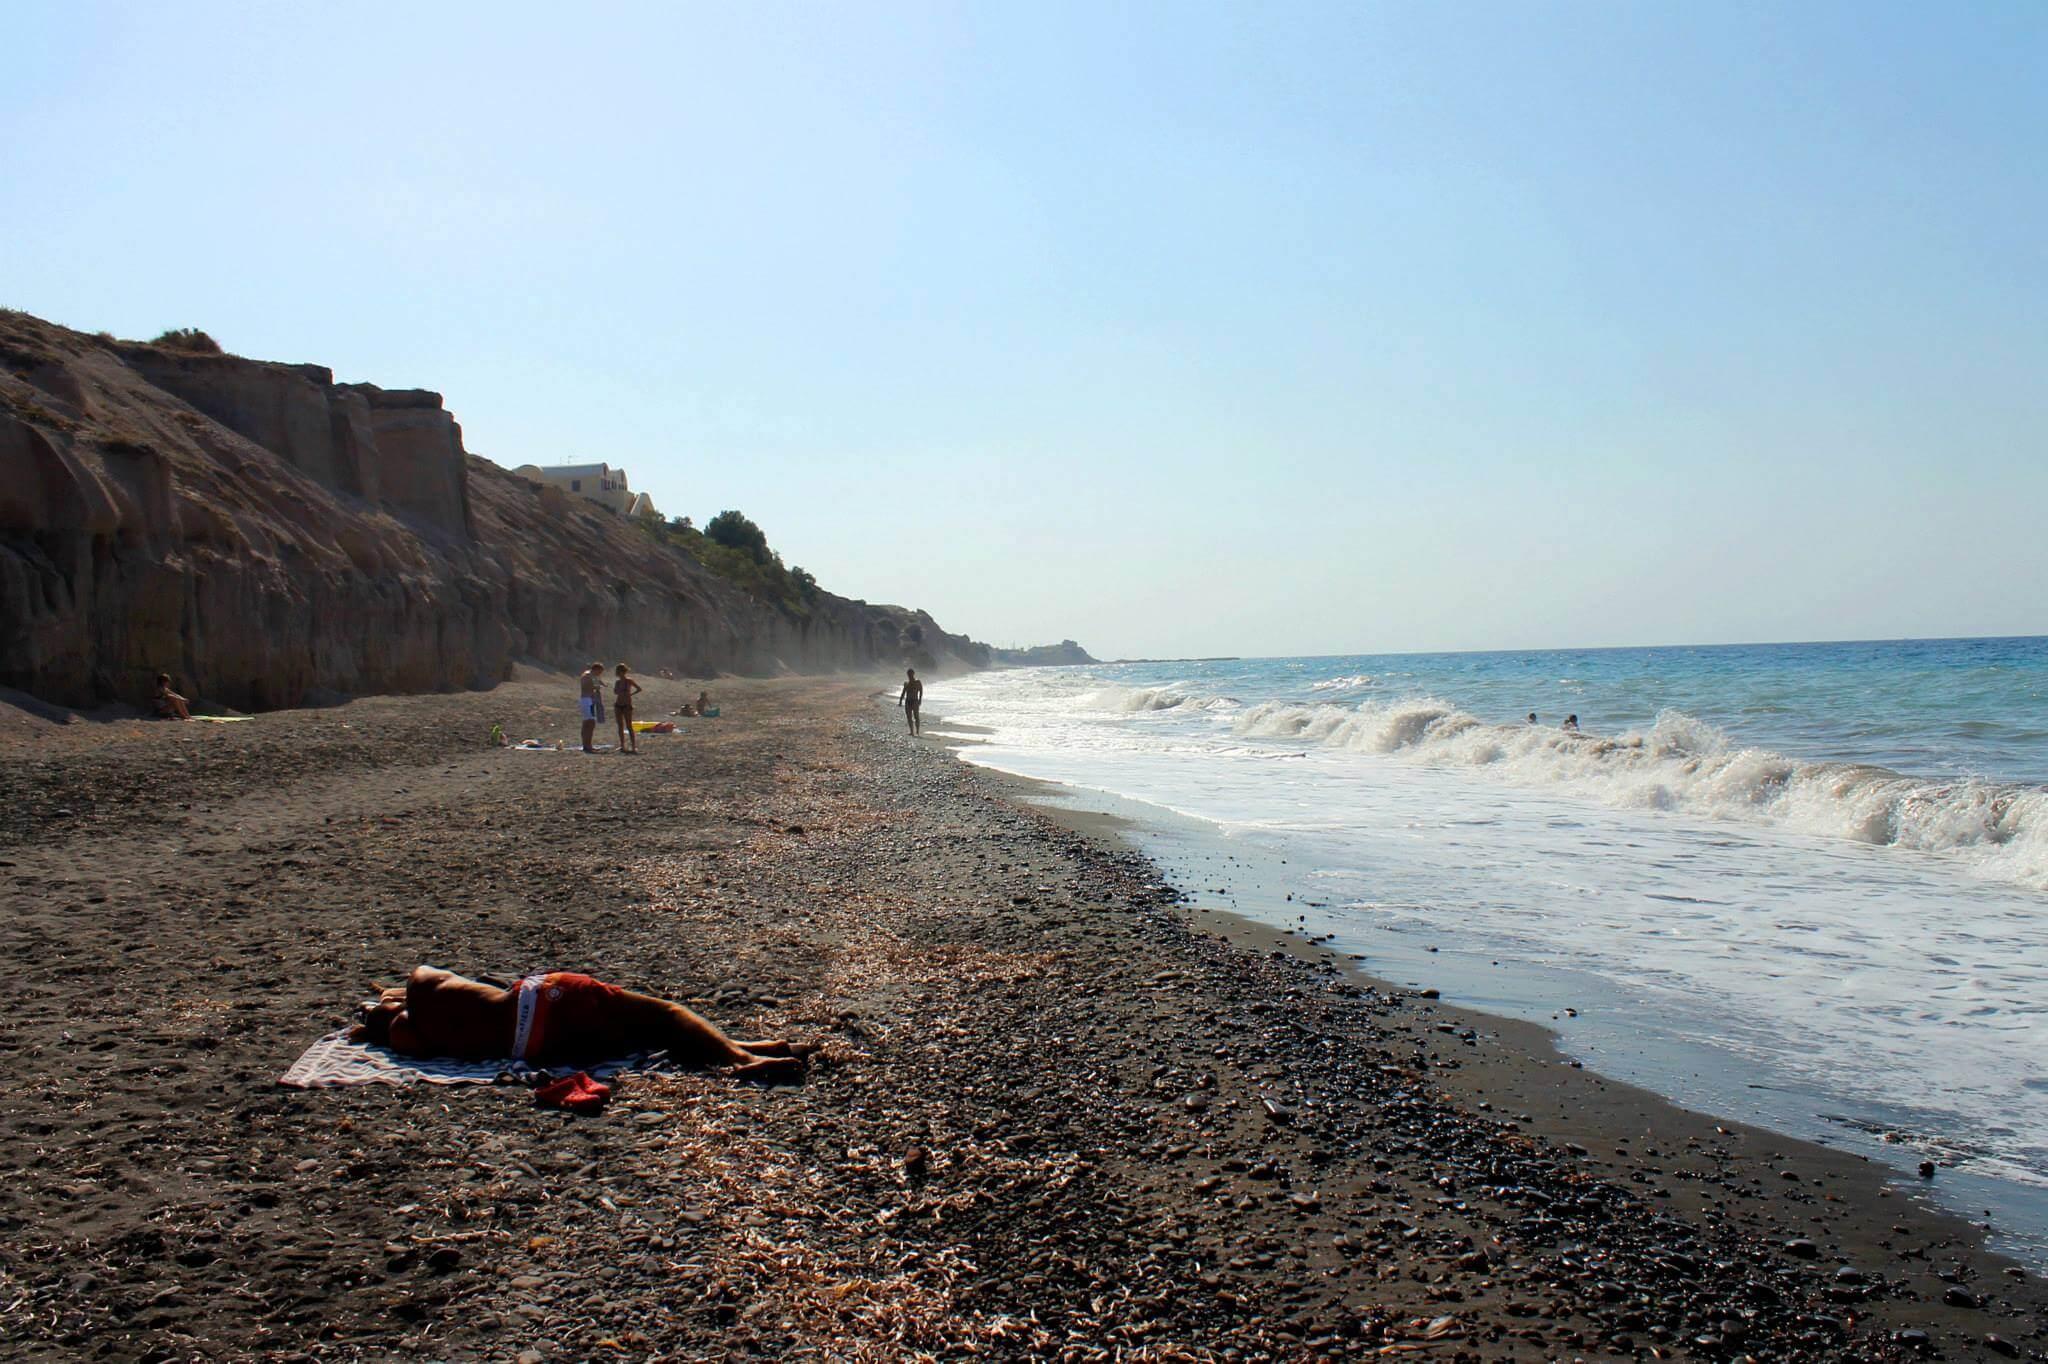 Vouvoulos Beach In Santorini Taken By Kirstie